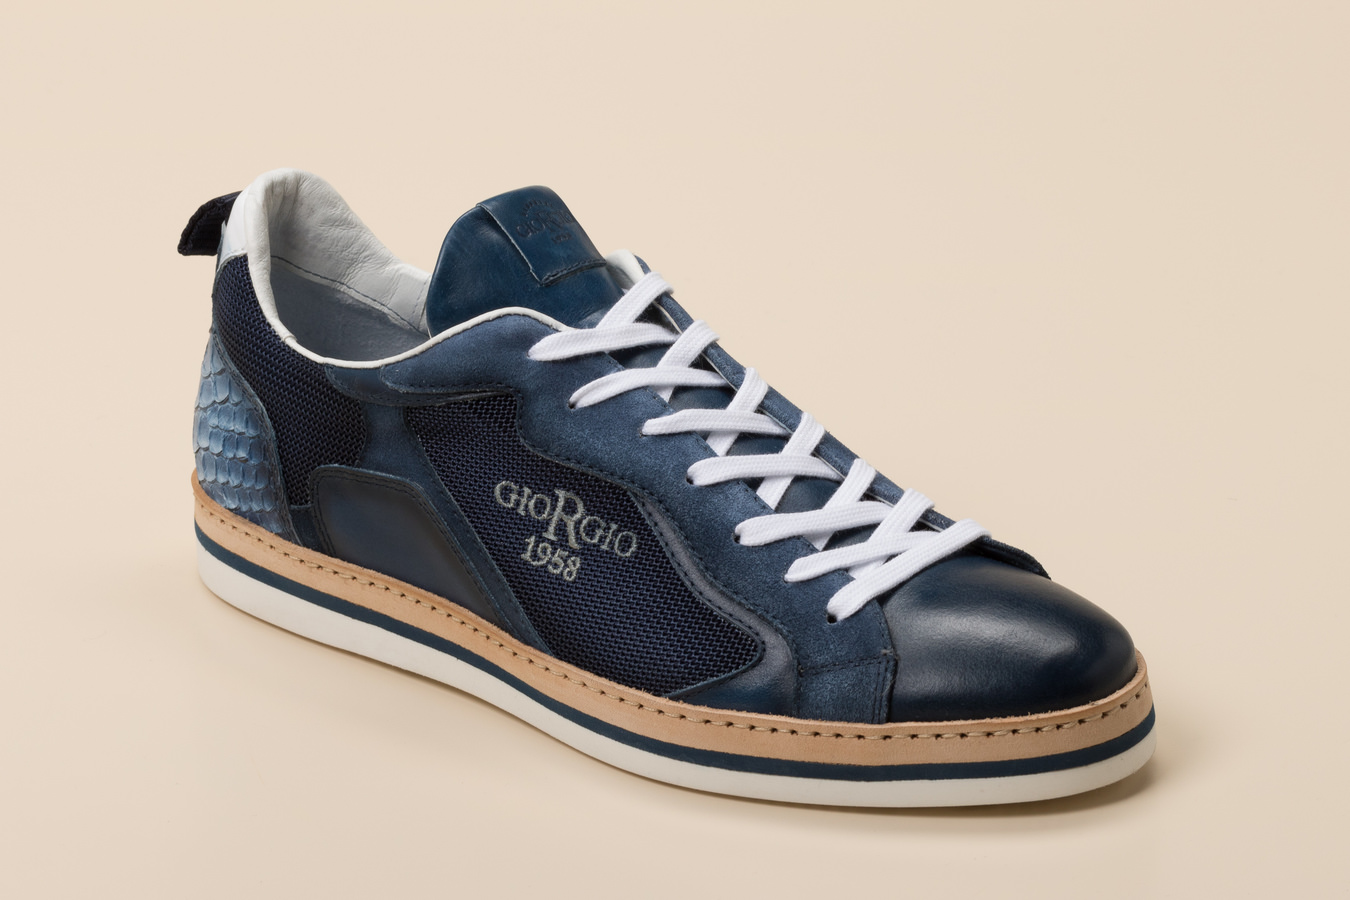 Giorgio Herren Sneaker in dunkelblau kaufen | Zumnorde Online Shop